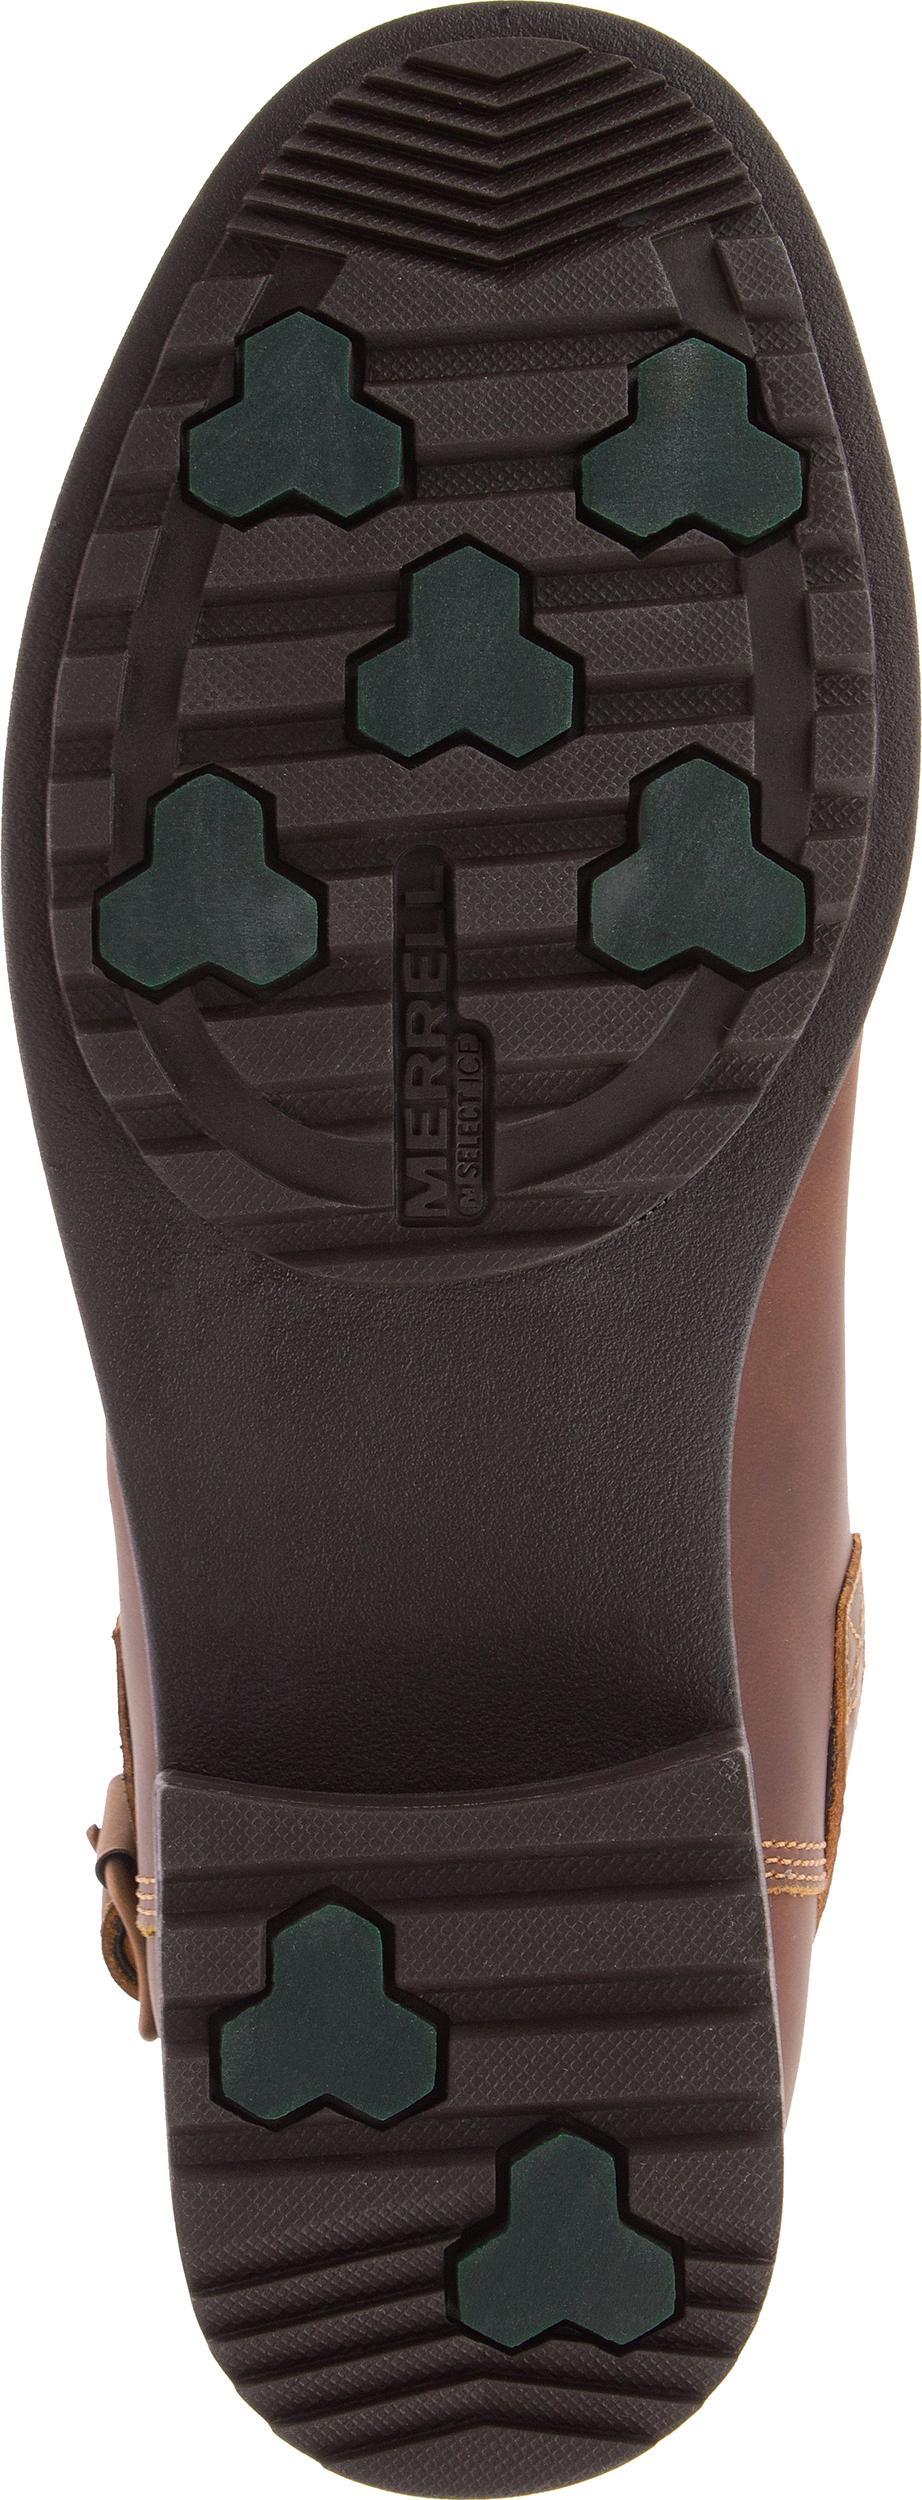 7282019f Merrell Sugarbush Belaya Waterproof Boots - Women's